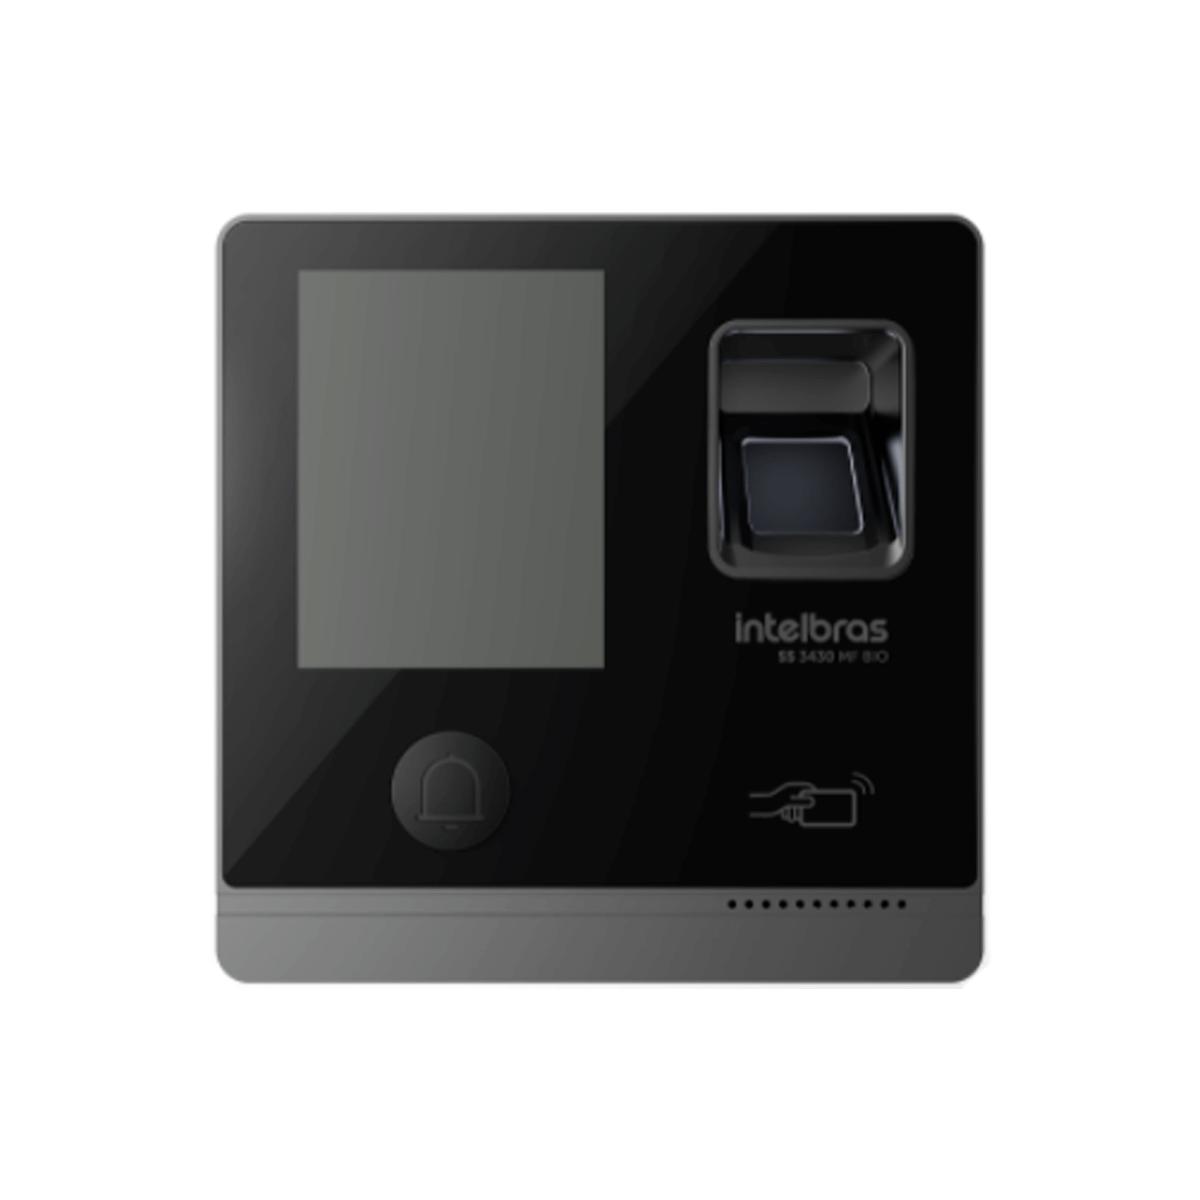 Controle de Acesso Intelbras RFID 13,56 MHz SS 3430 MF Bio